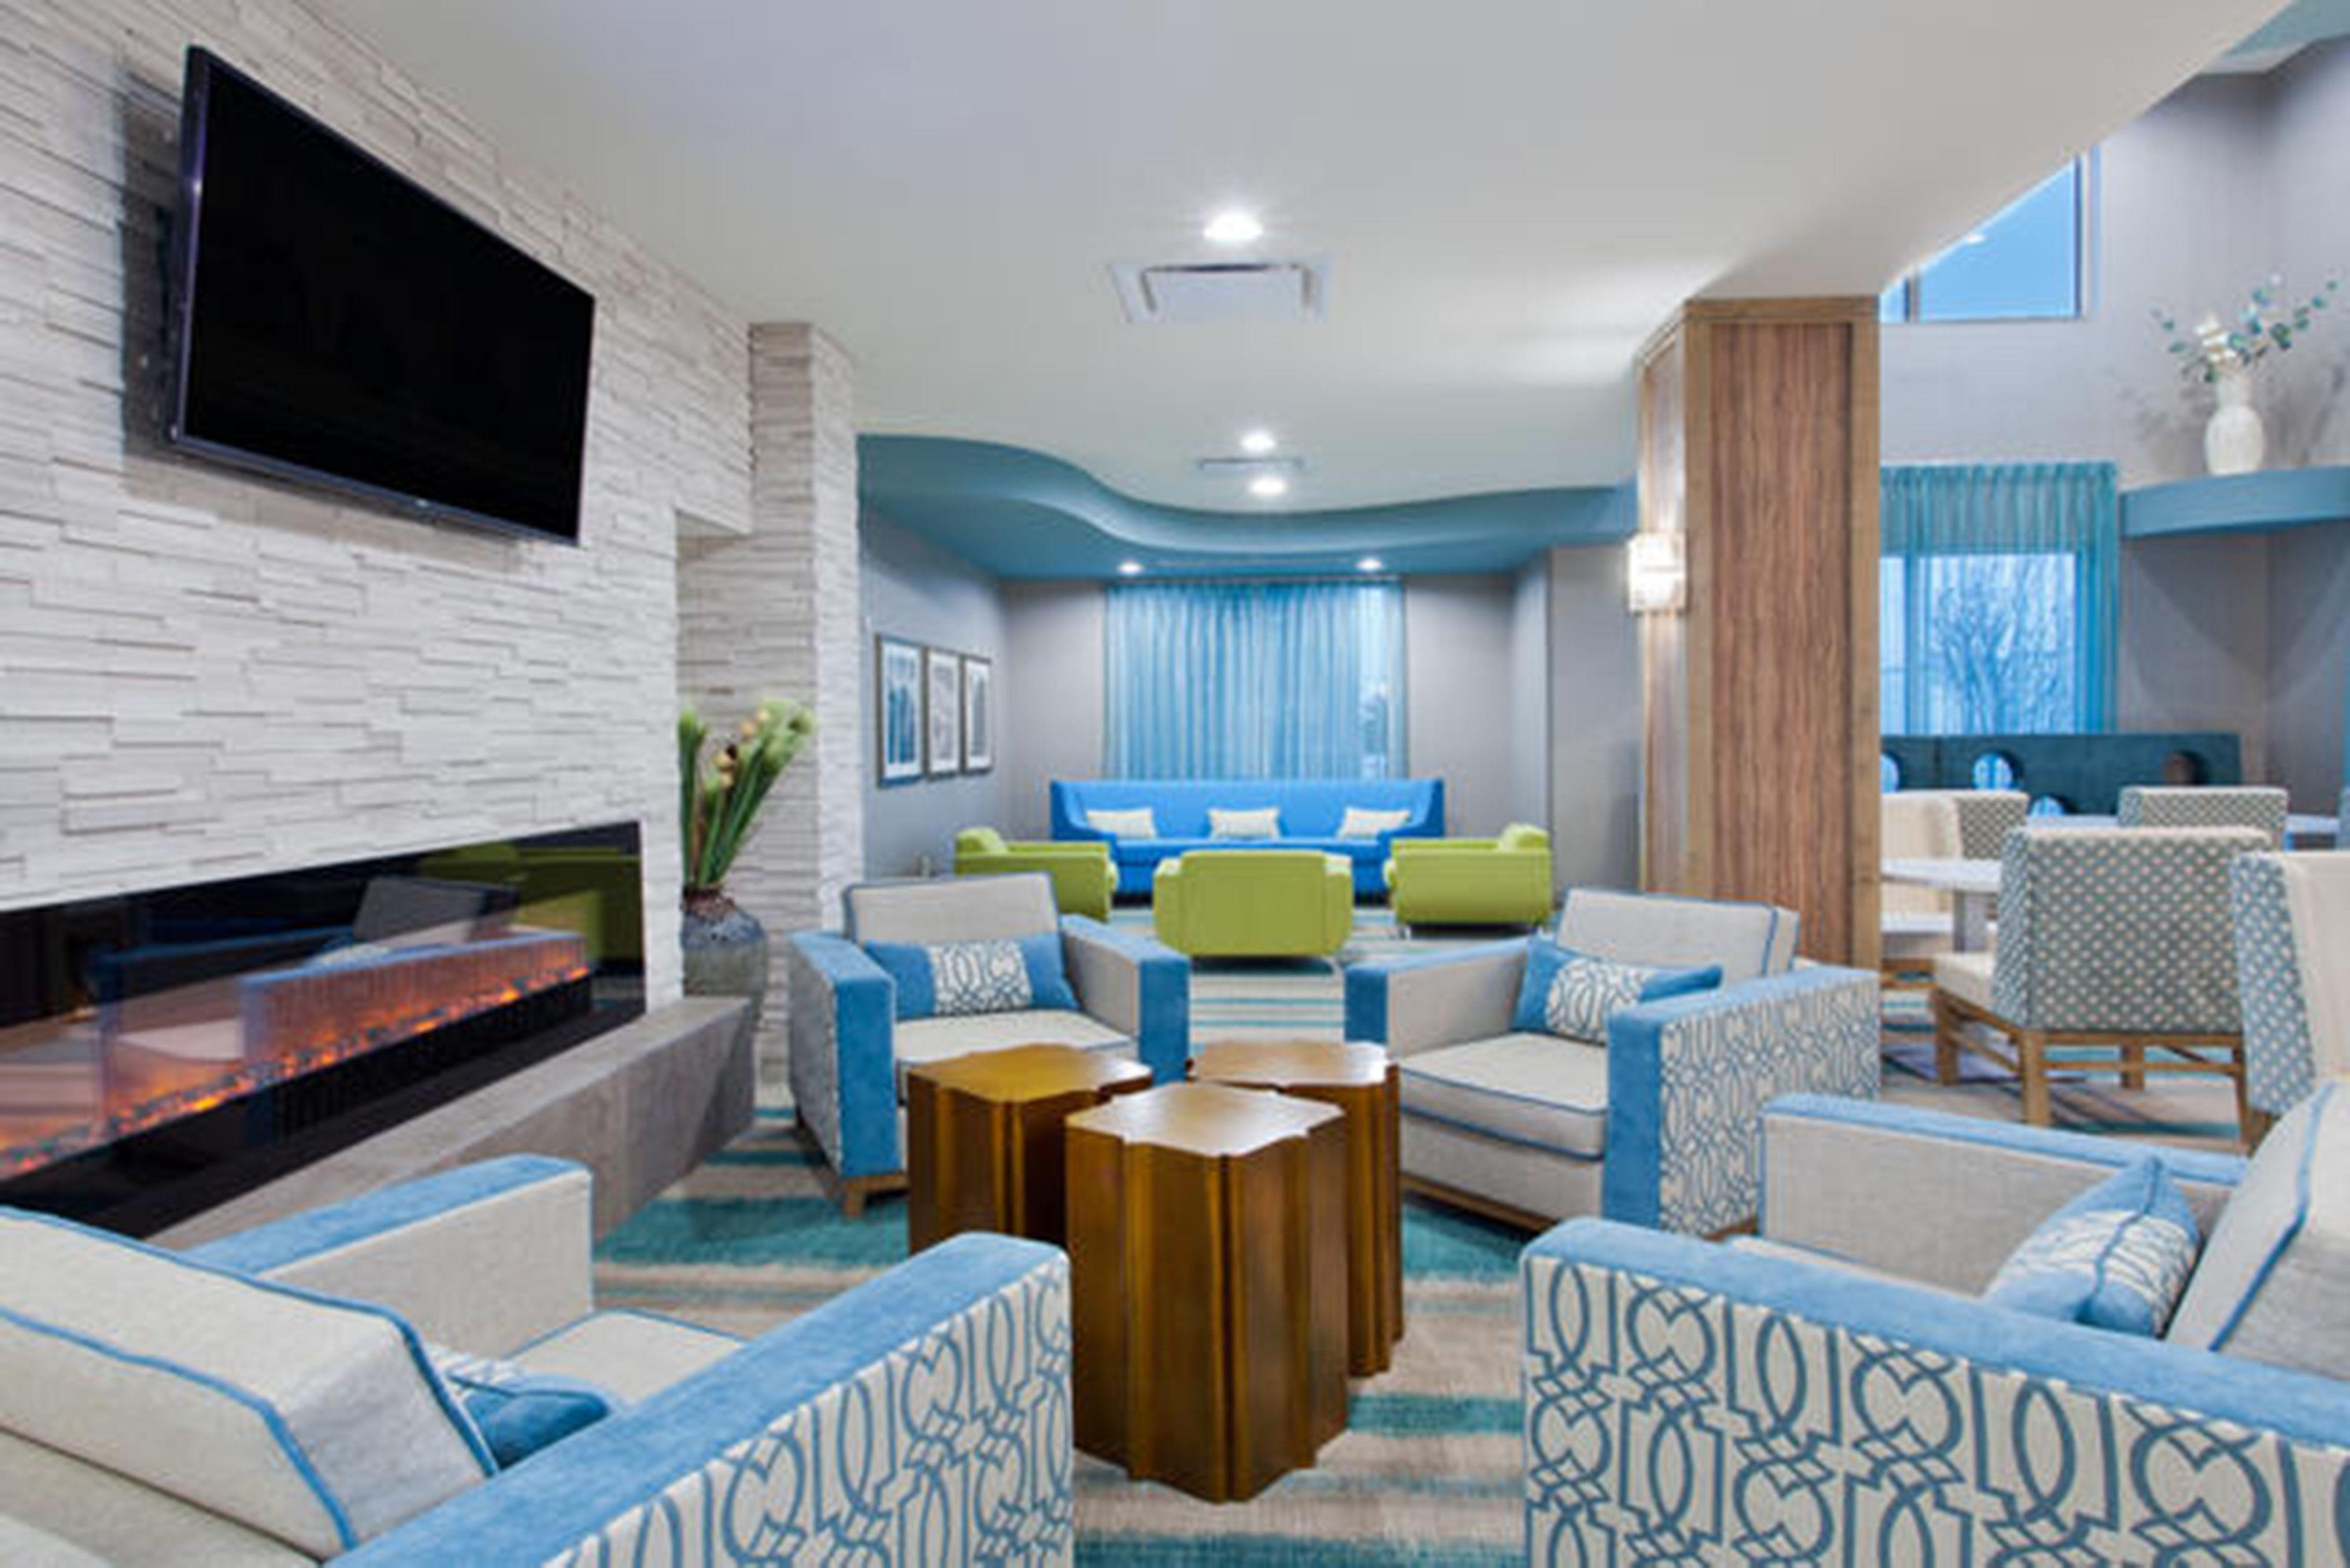 Holiday Inn Express & Suites Warner Robins North West image 4